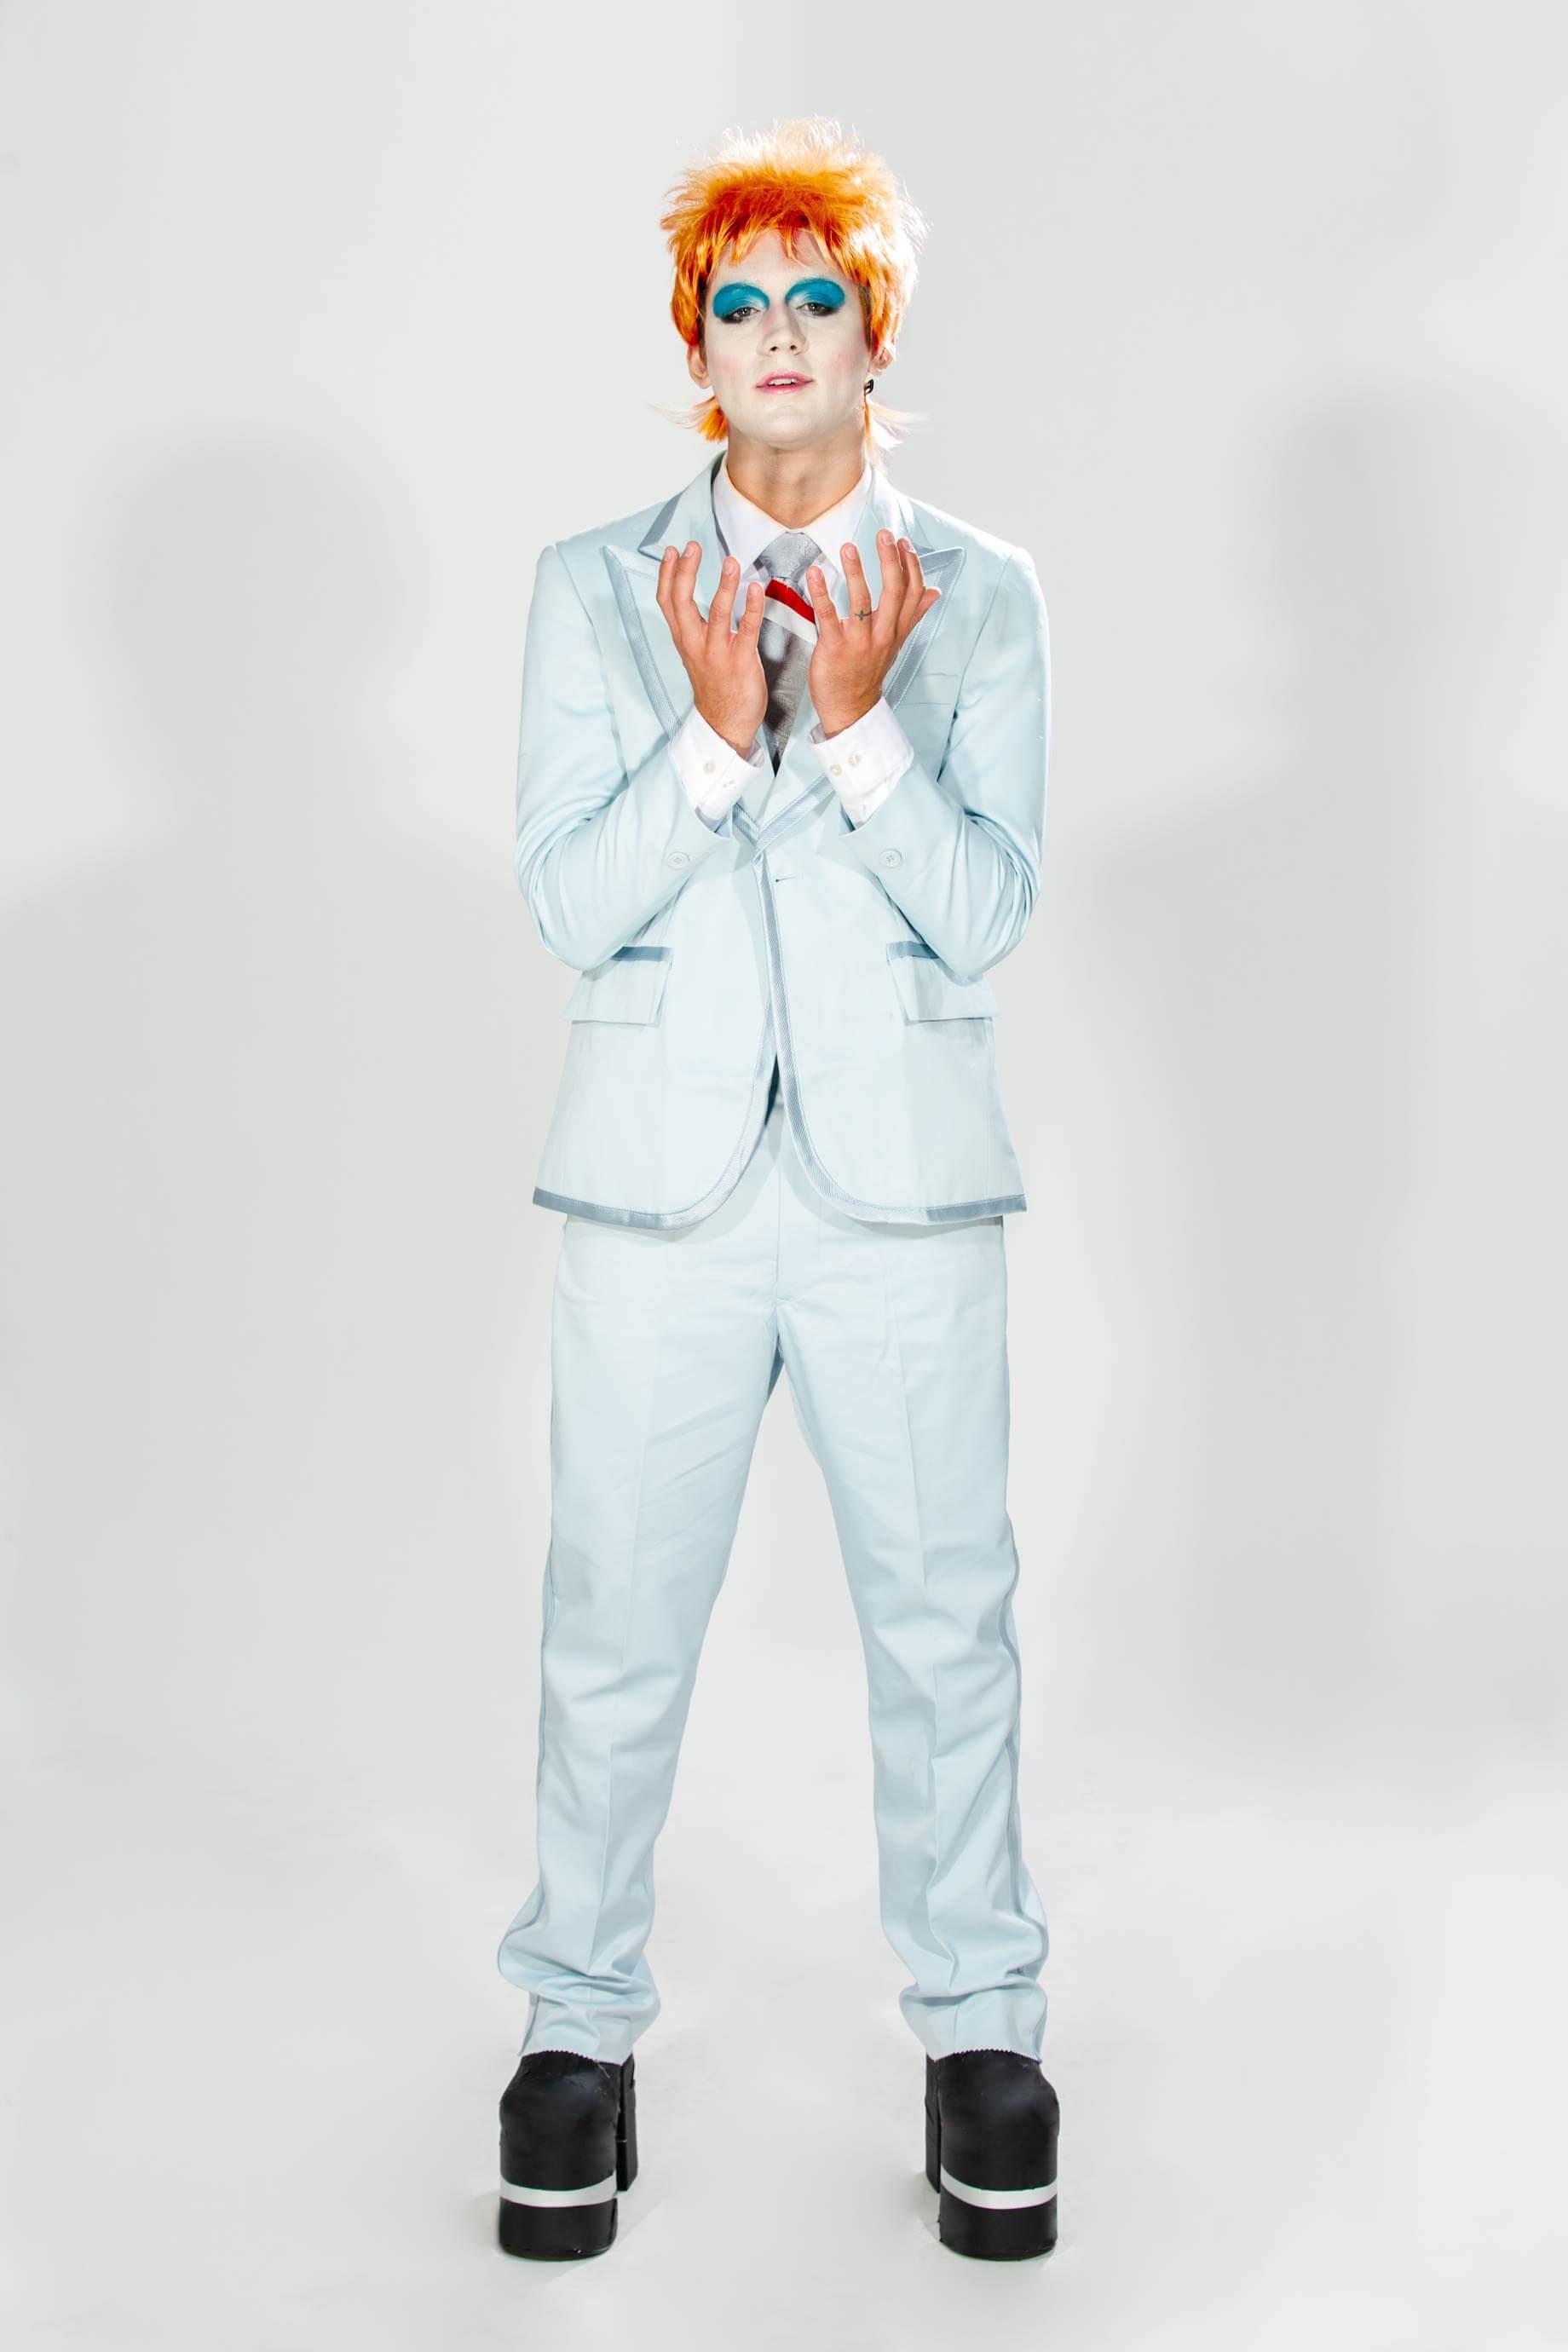 David Bowie Halloween Costume